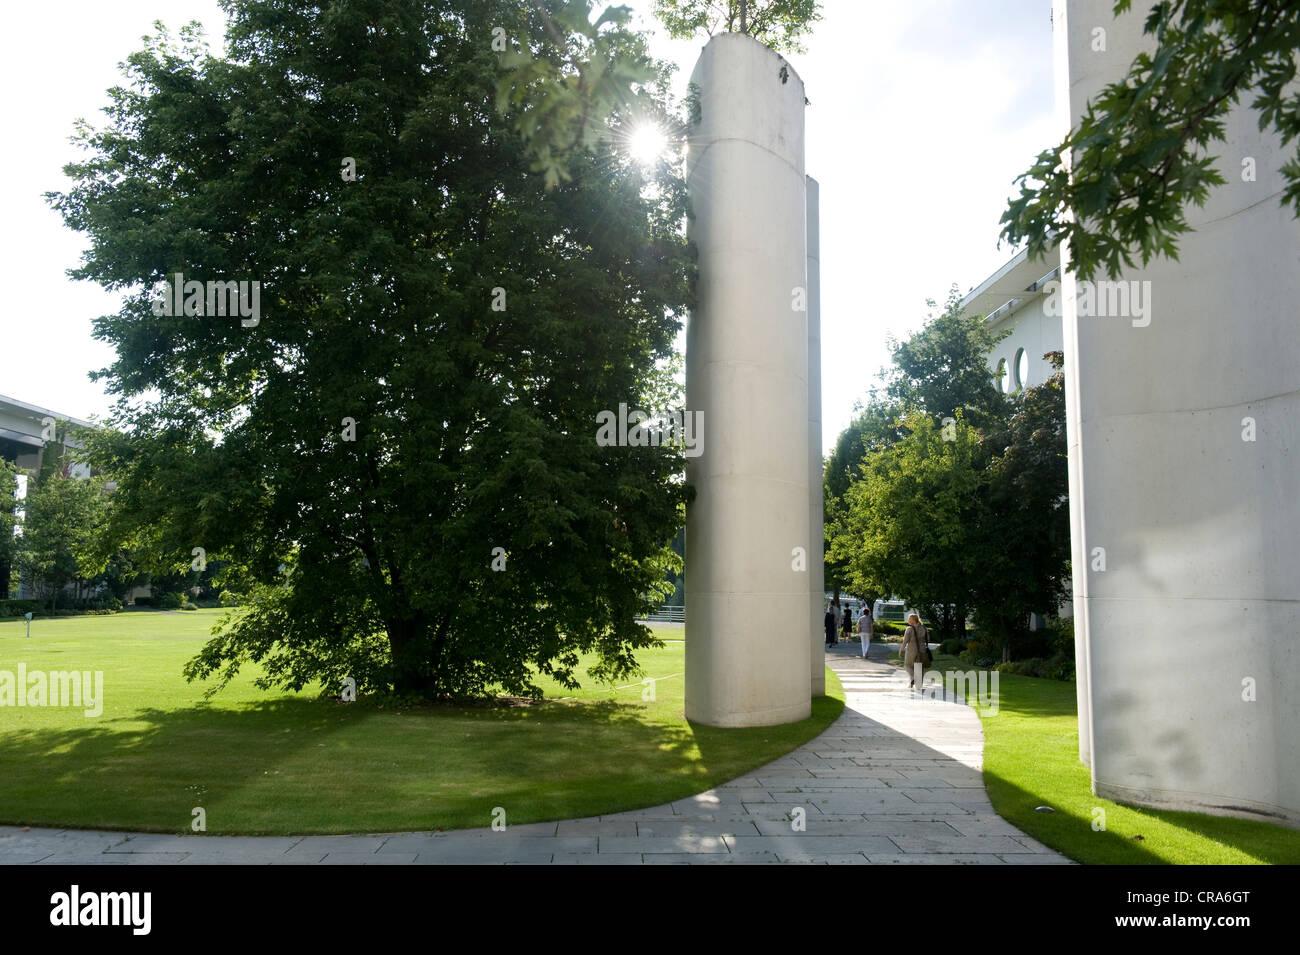 View from the garden, Bundeskanzleramt Federal Chancellery, Berlin, Germany, Europe Stock Photo